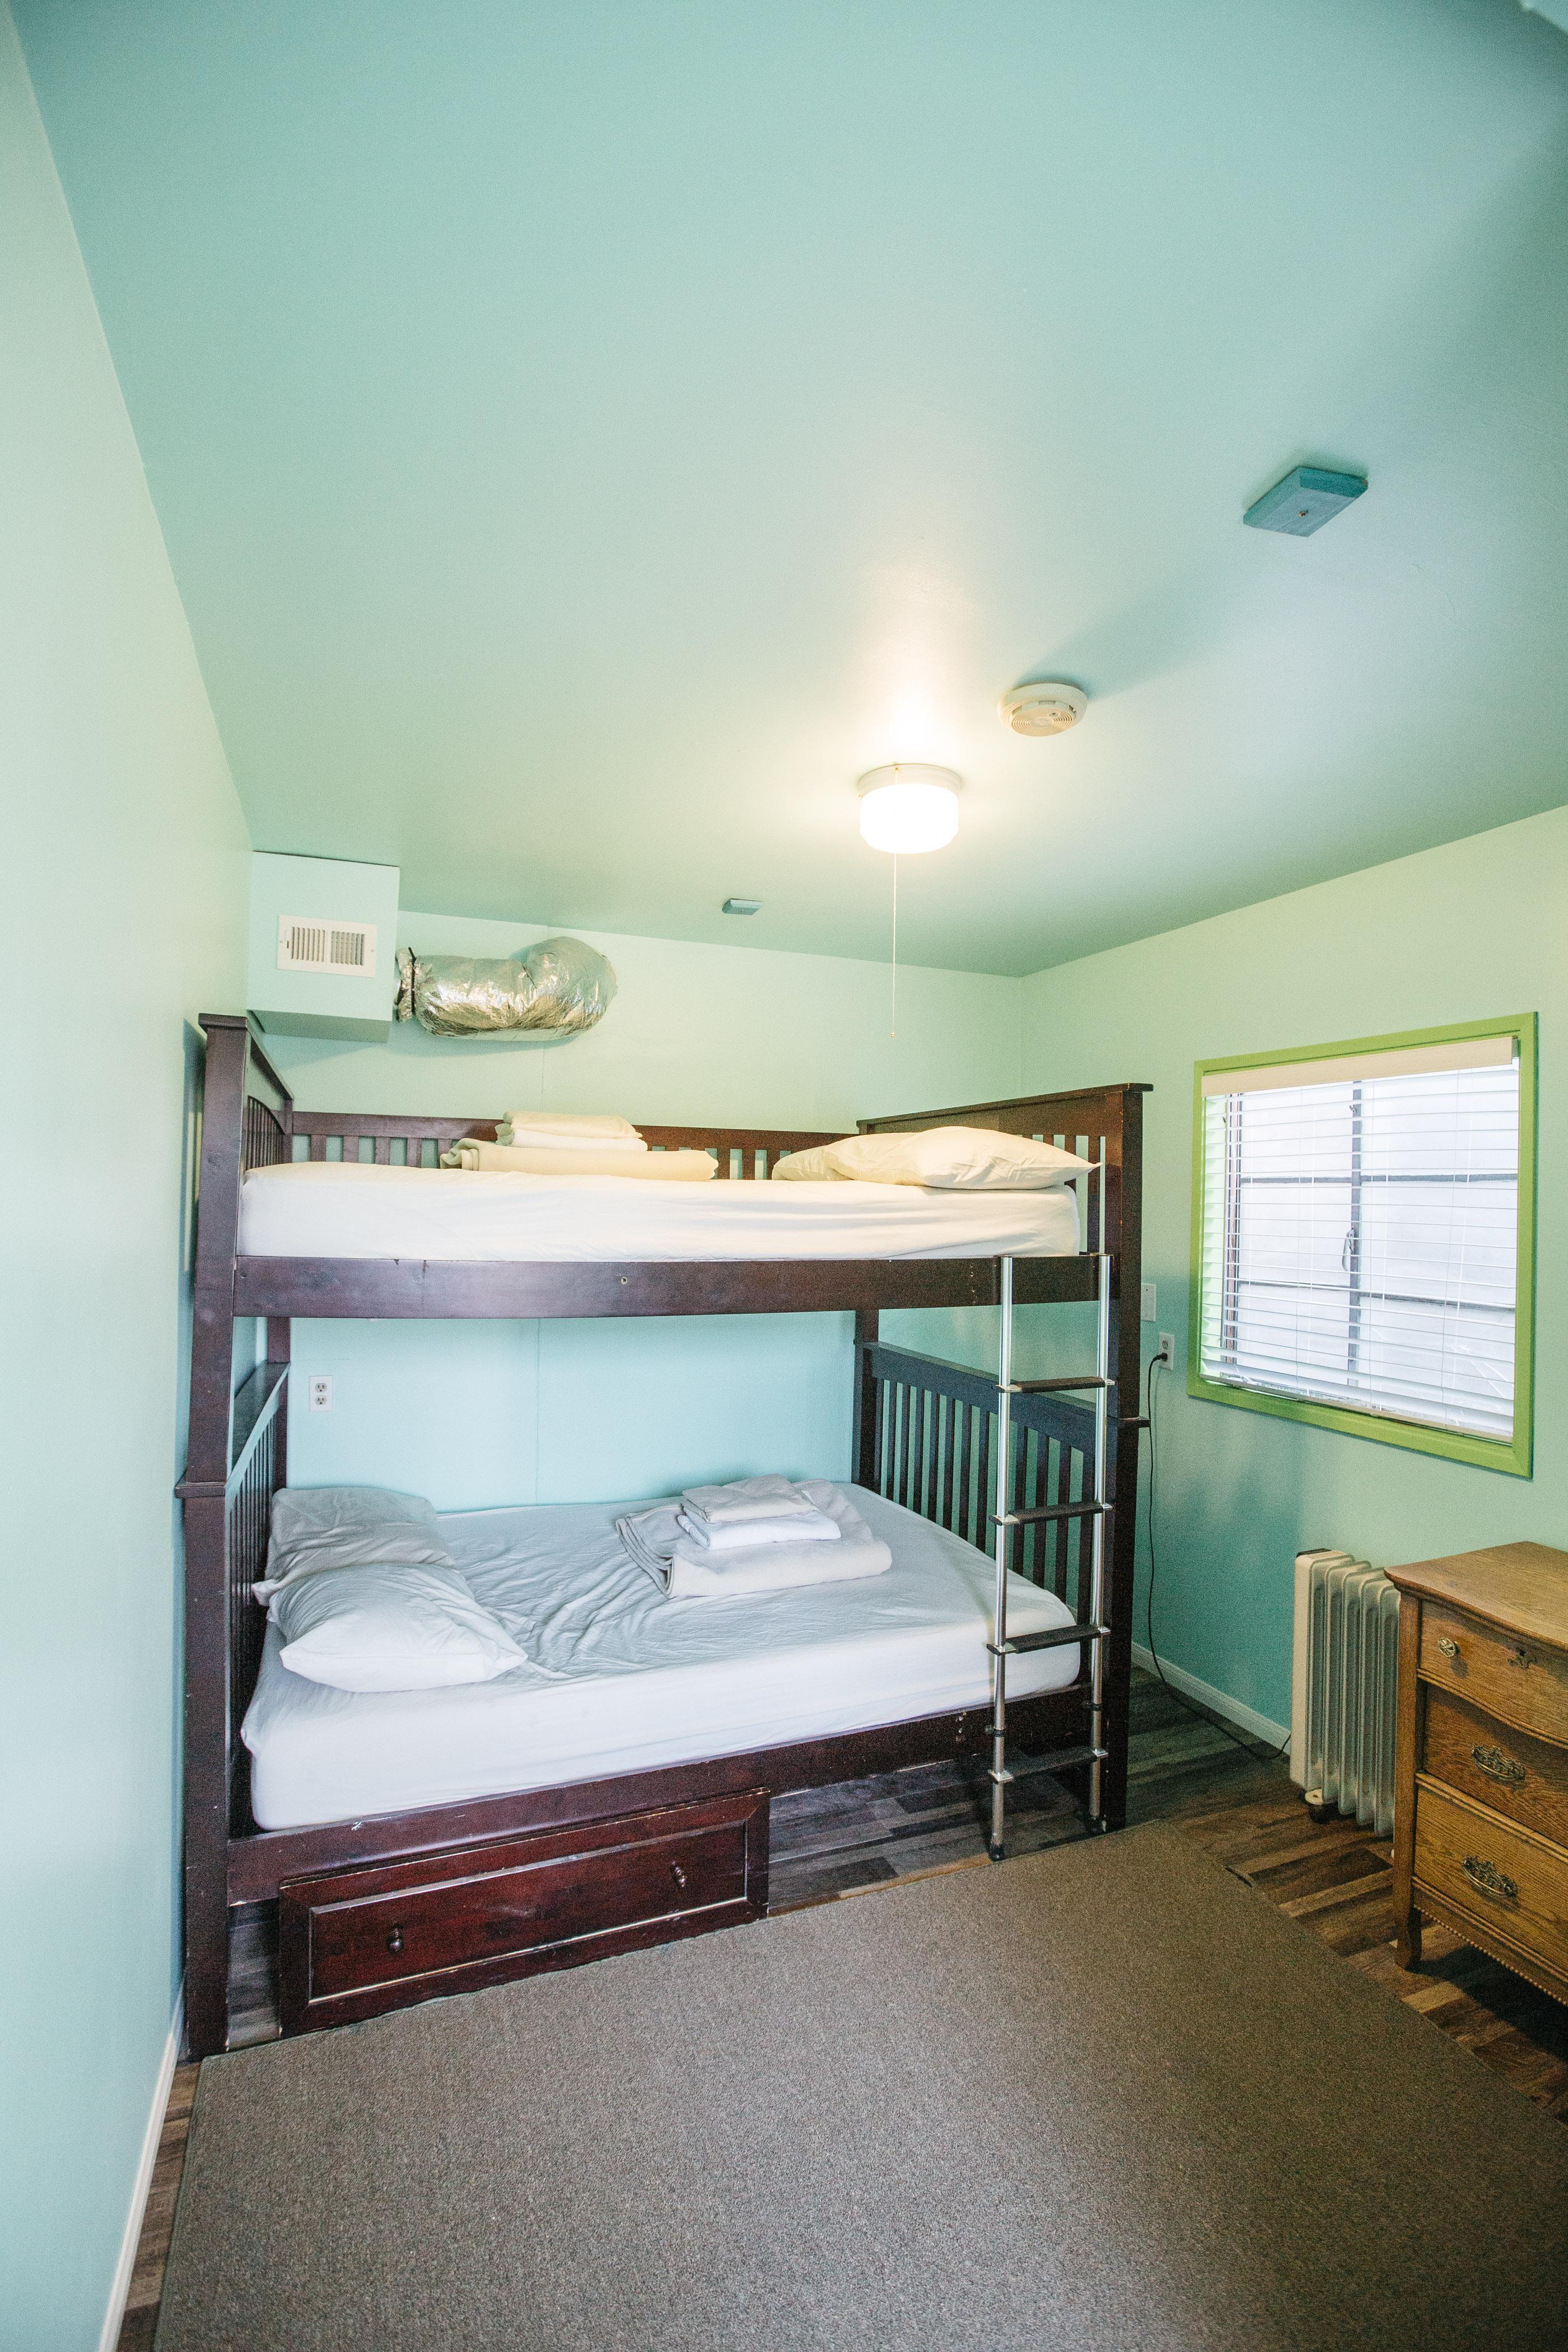 The Hostel California